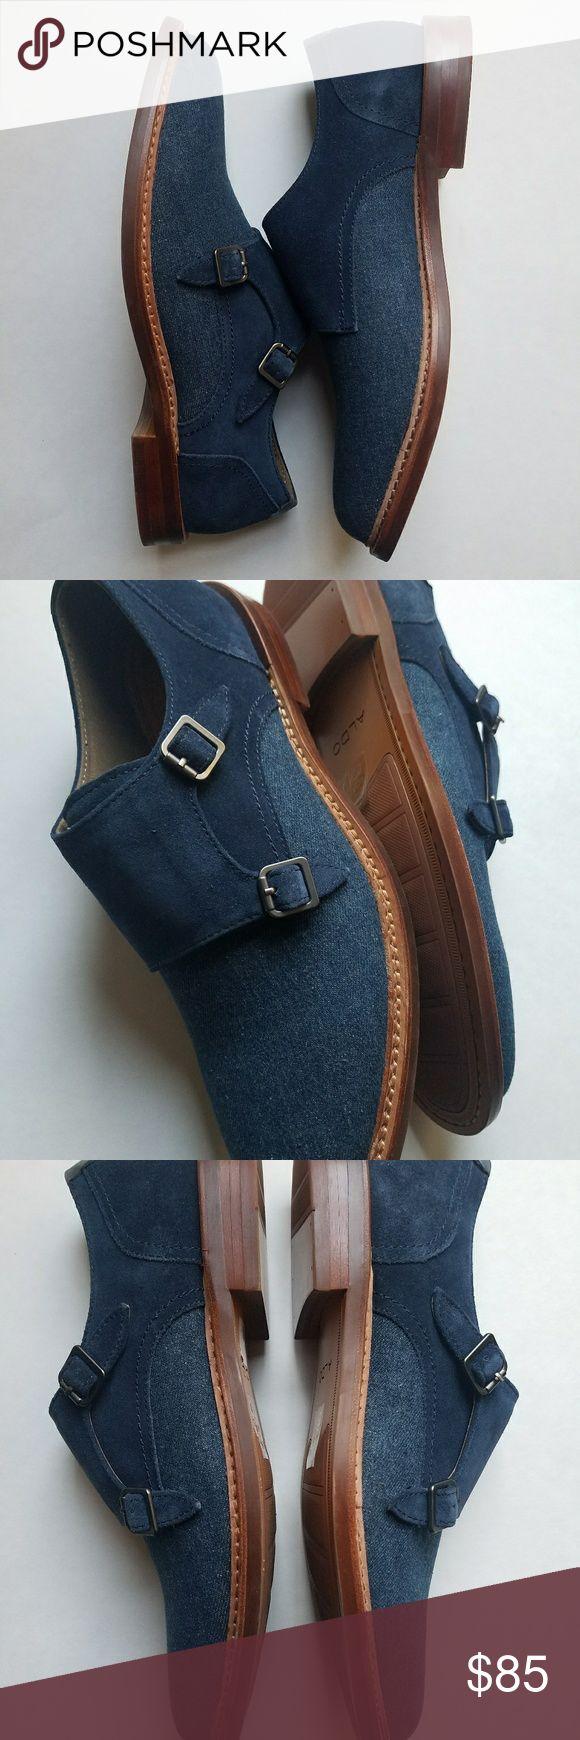 Aldo Chigodda NAVY - Two-Tone Finish in Leather and Suede - Monk Strap Shoe - ELEGANT - COMFORTABLE  -TTS Aldo Shoes